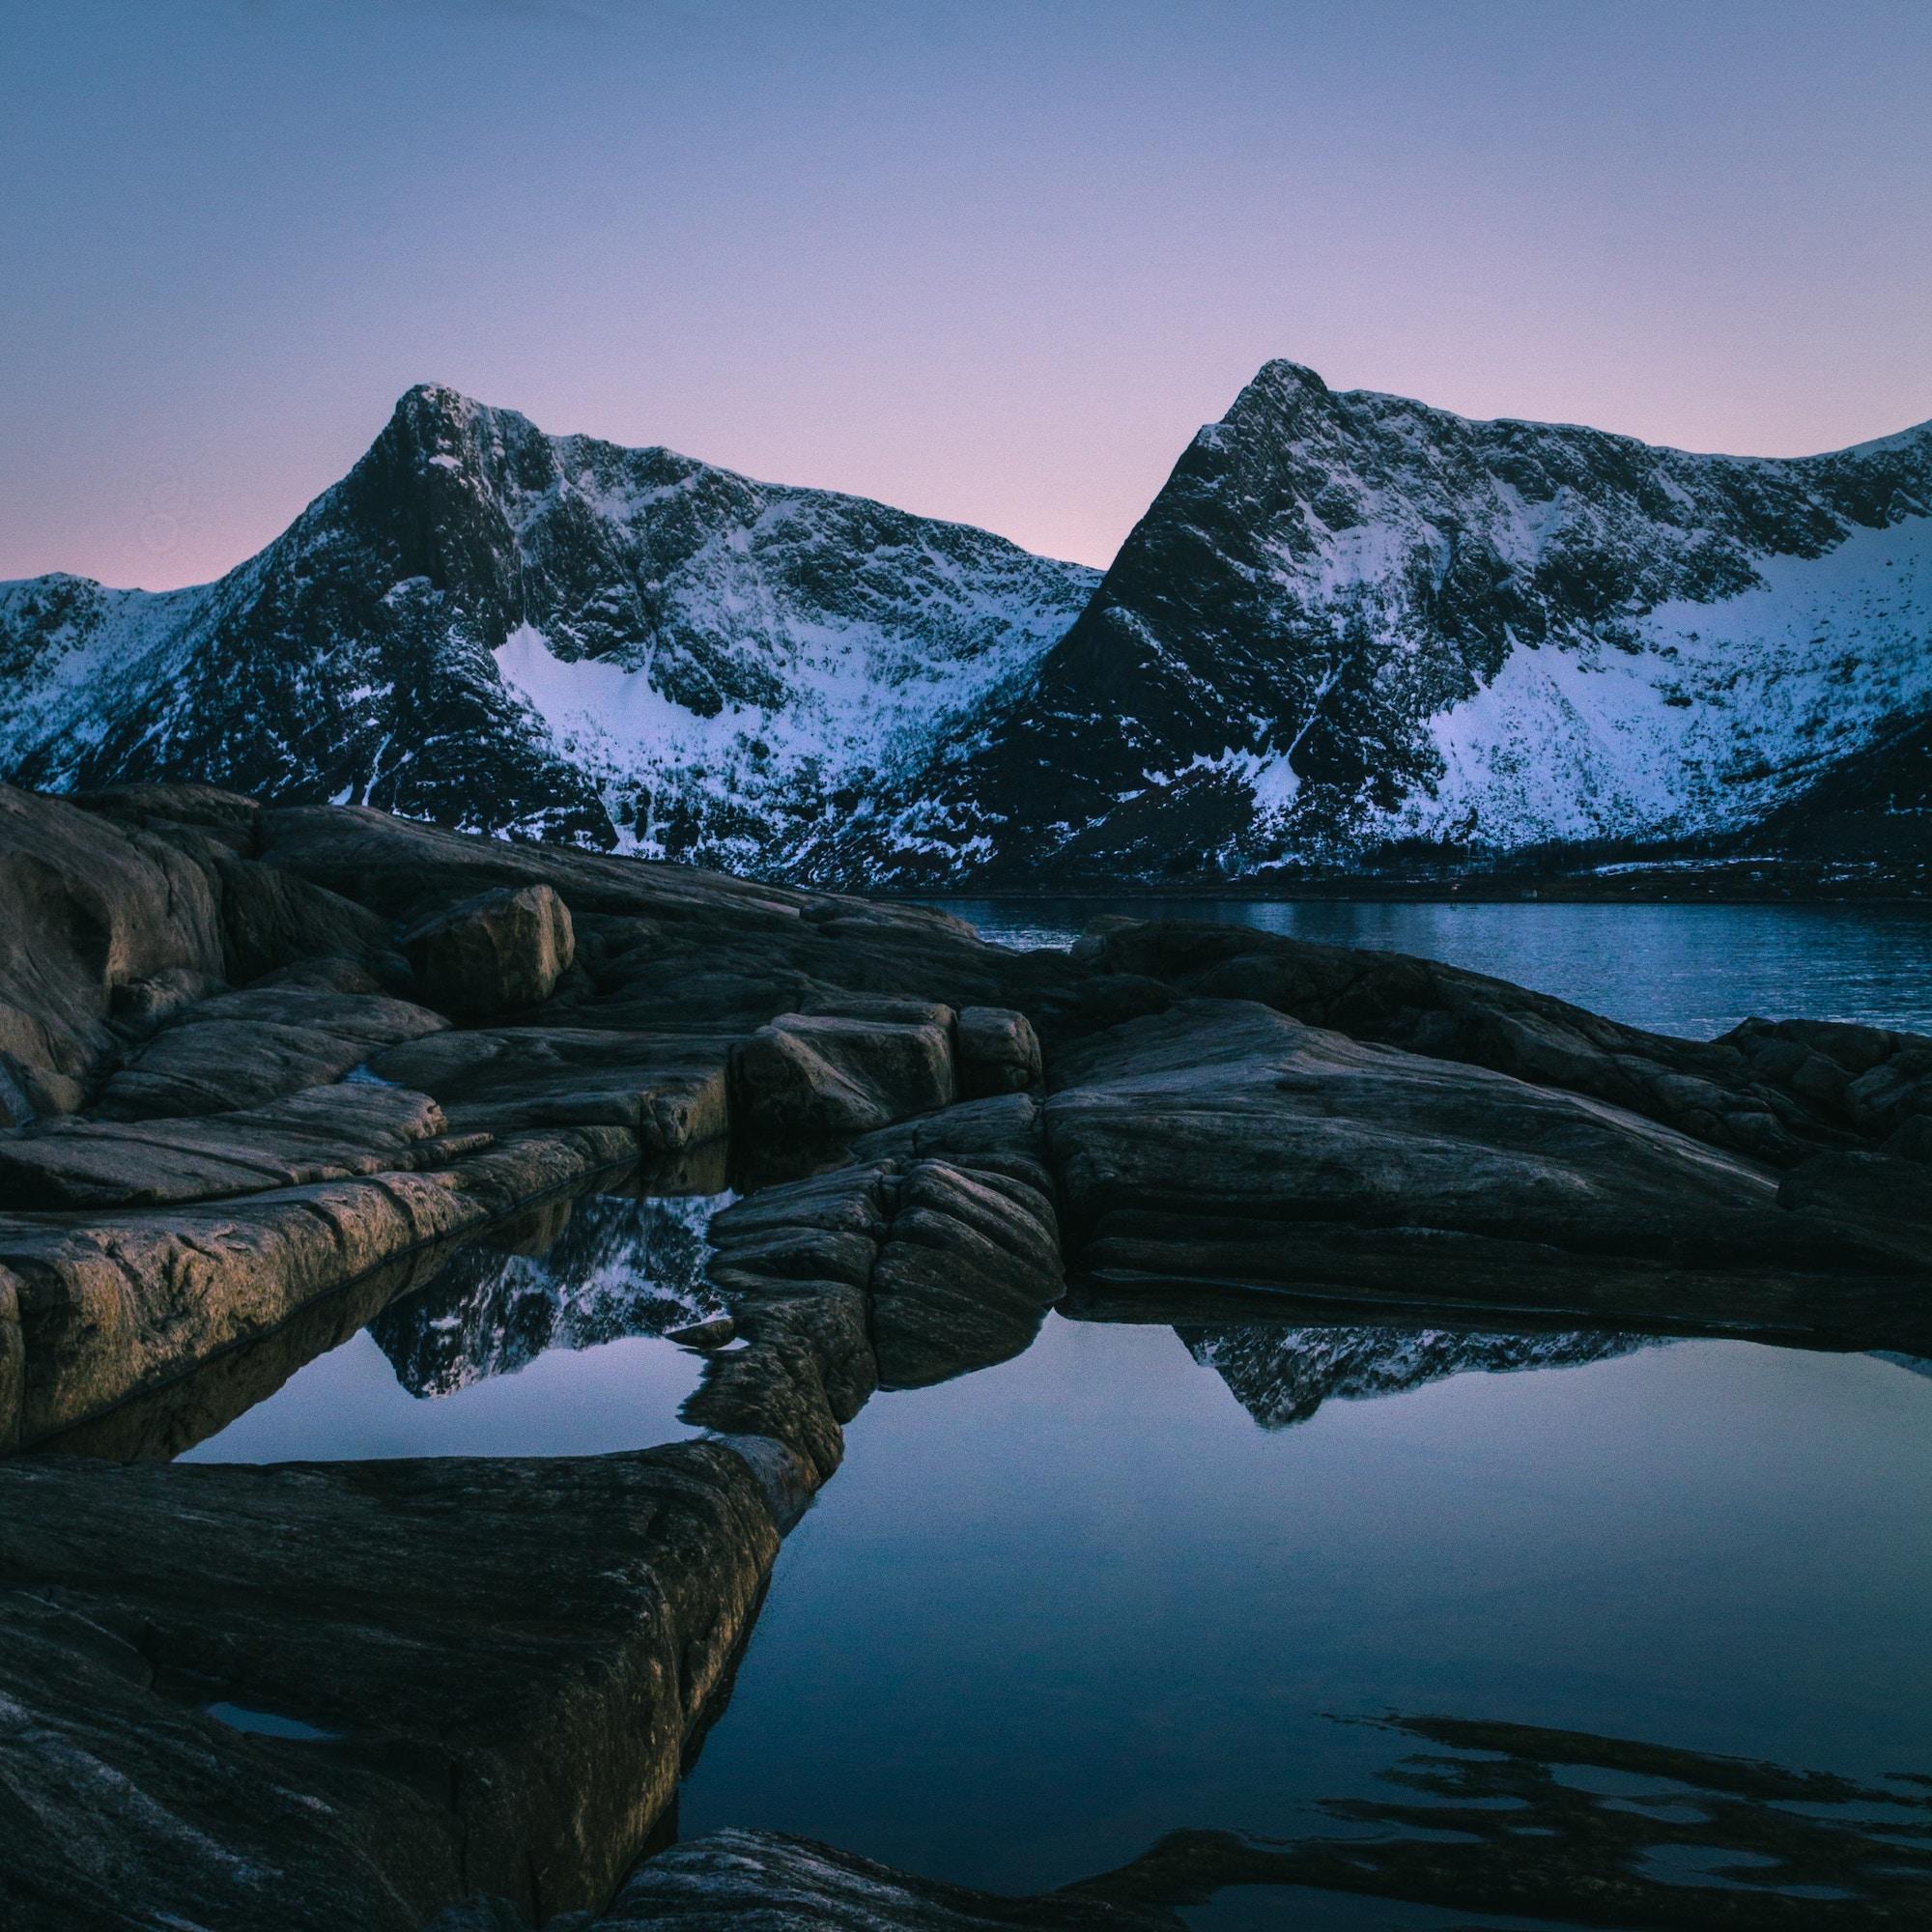 Arctic-sailing-expedition-3.jpg